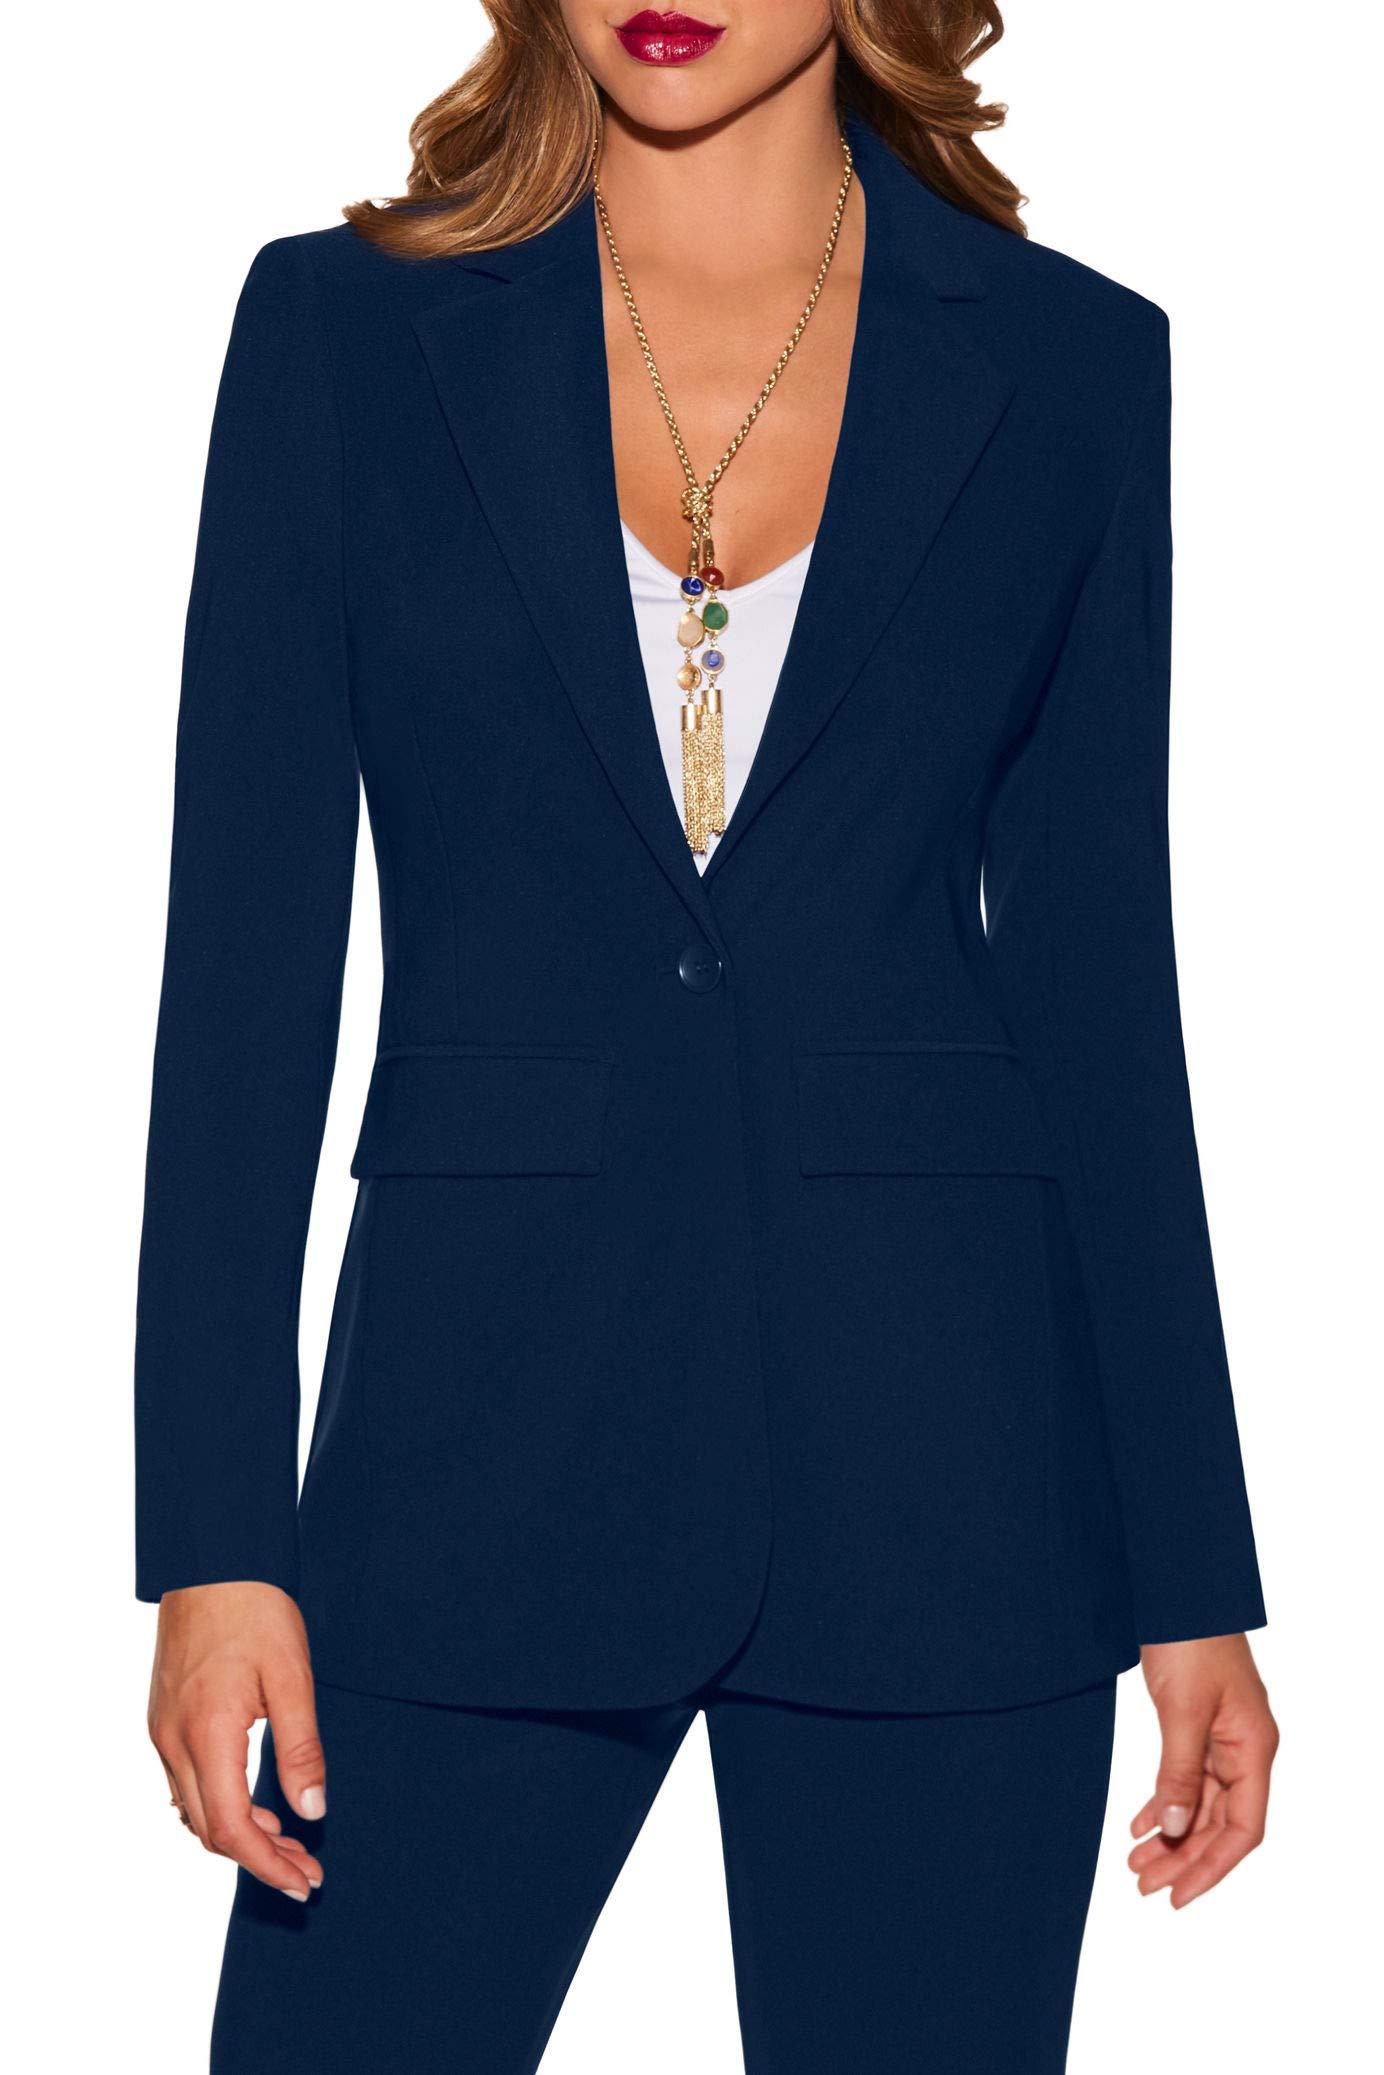 Beyond Travel Women's Wrinkle-Resistant Classic One-Button Solid Color Boyfriend Knit Blazer Maritime Navy 10